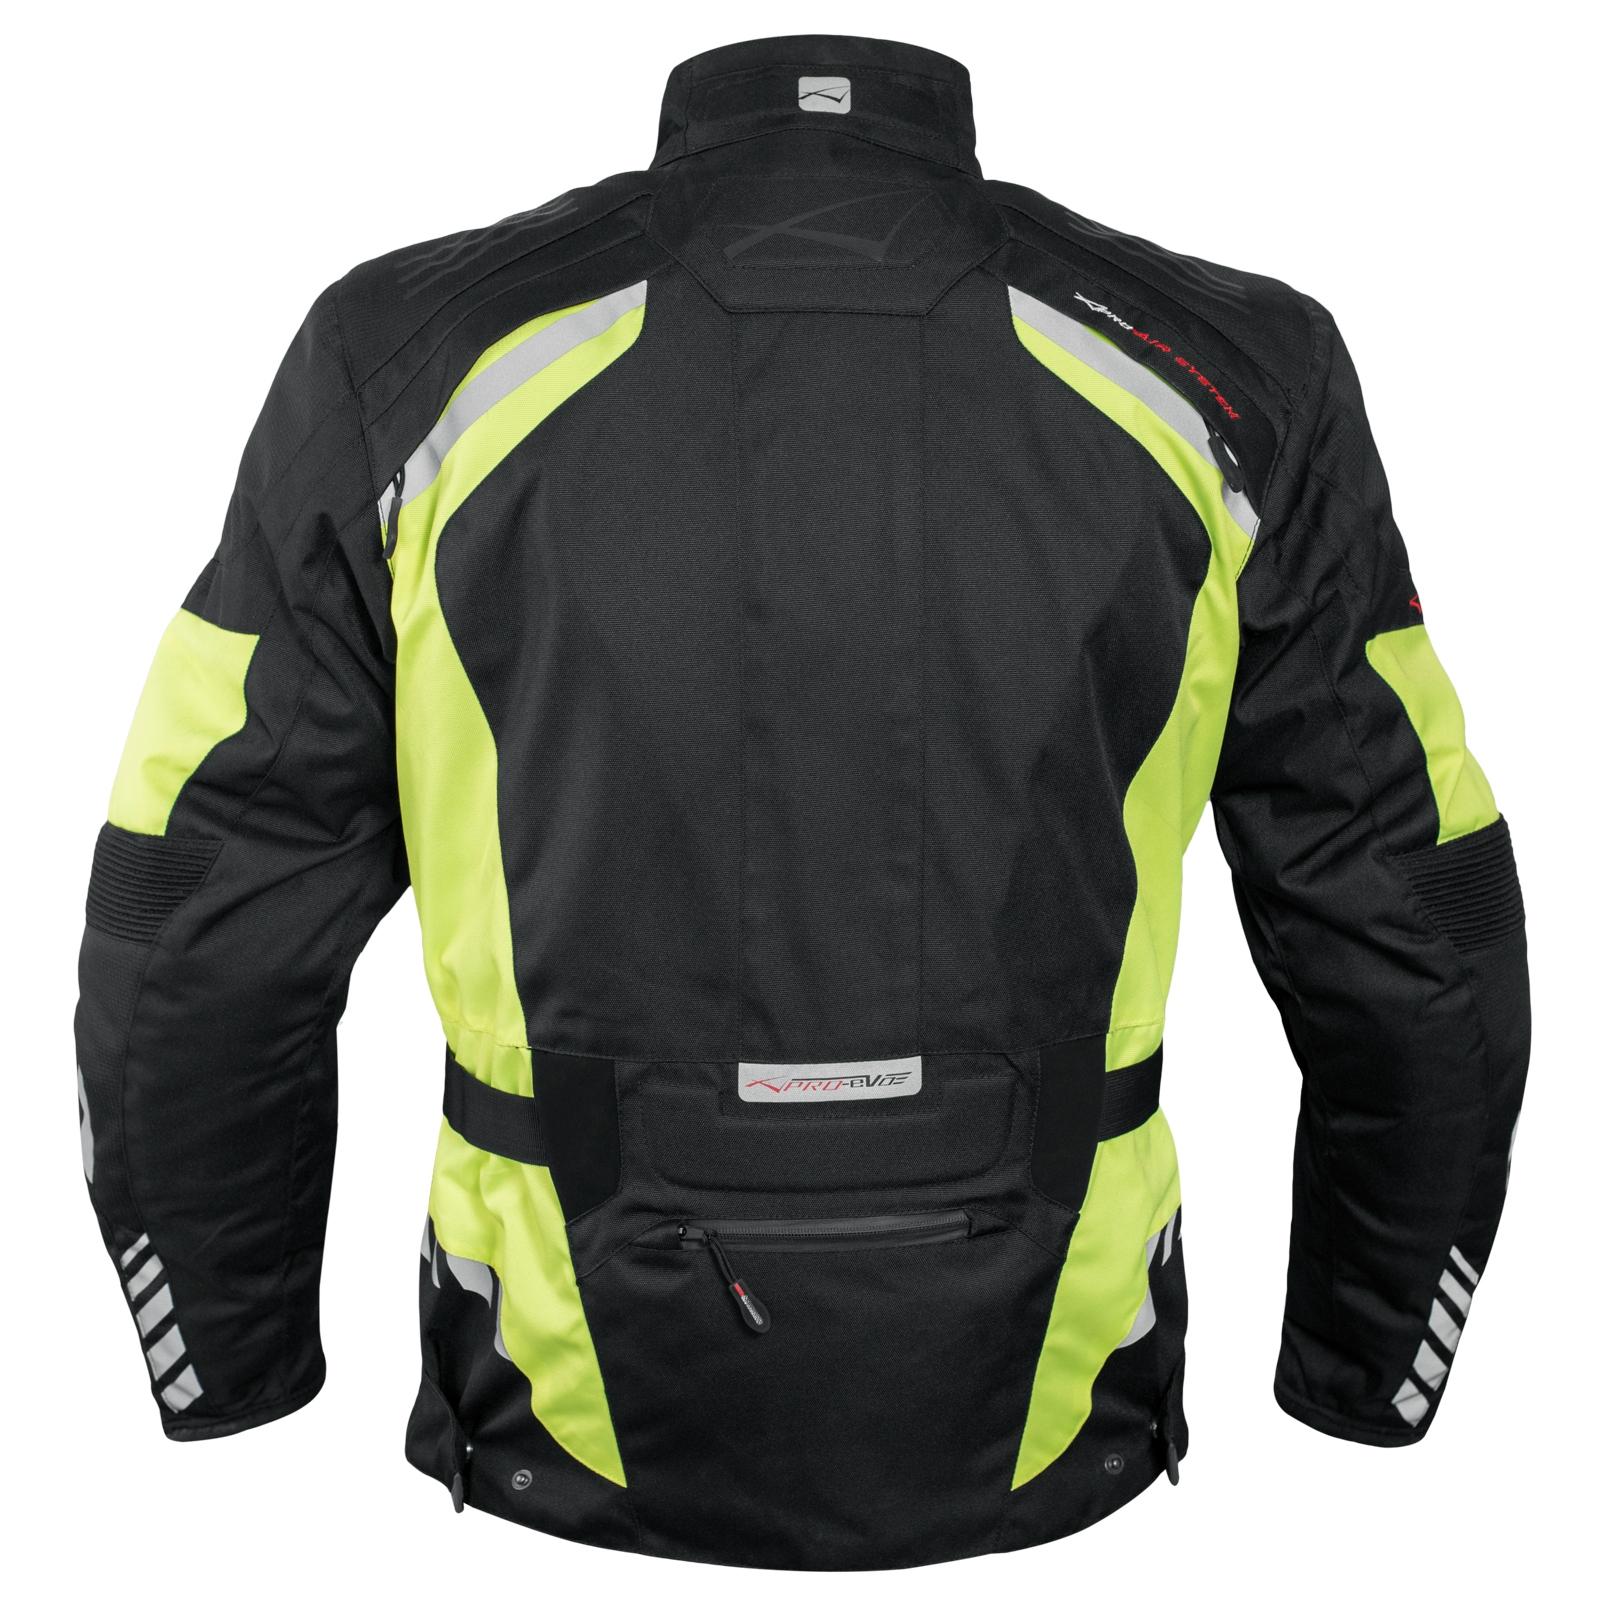 Blouson-Moto-Tissu-Veste-Impermeable-Doublure-Hivernale-Reflechissant-Respirant miniature 14